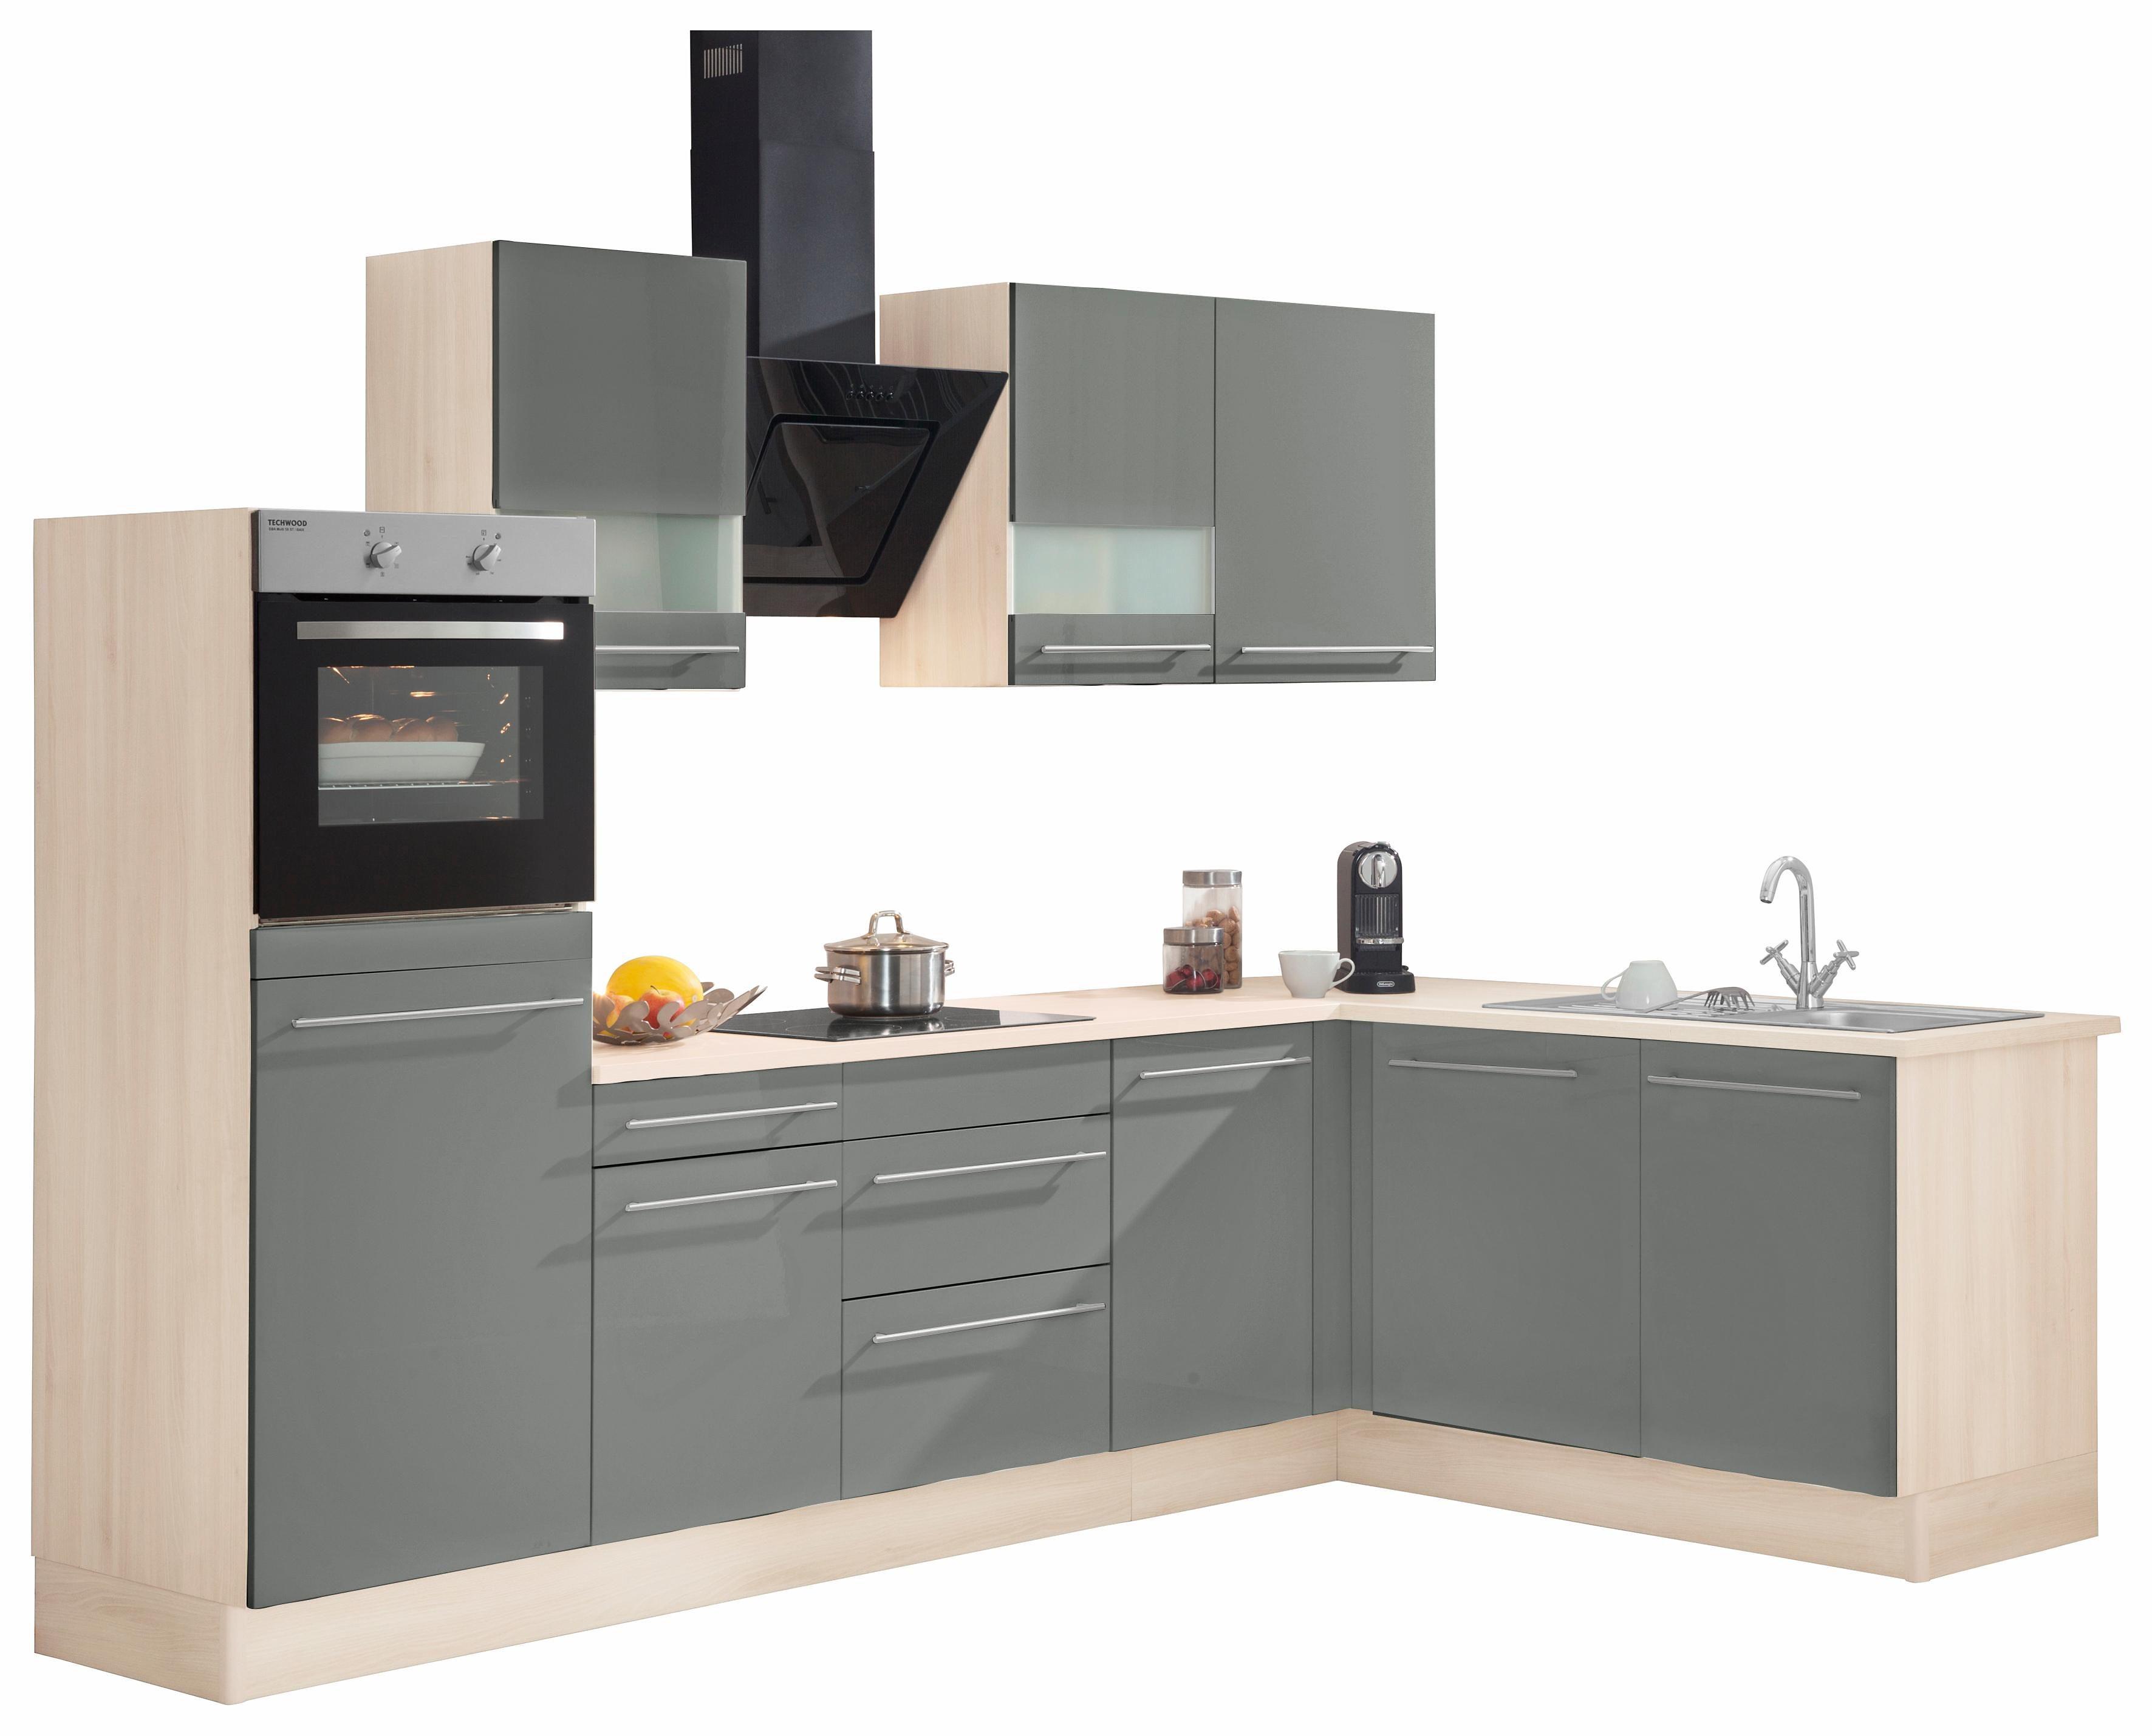 optifit winkelk che kalmar ohne e ger te breite 300x175 cm moebel suchmaschine. Black Bedroom Furniture Sets. Home Design Ideas